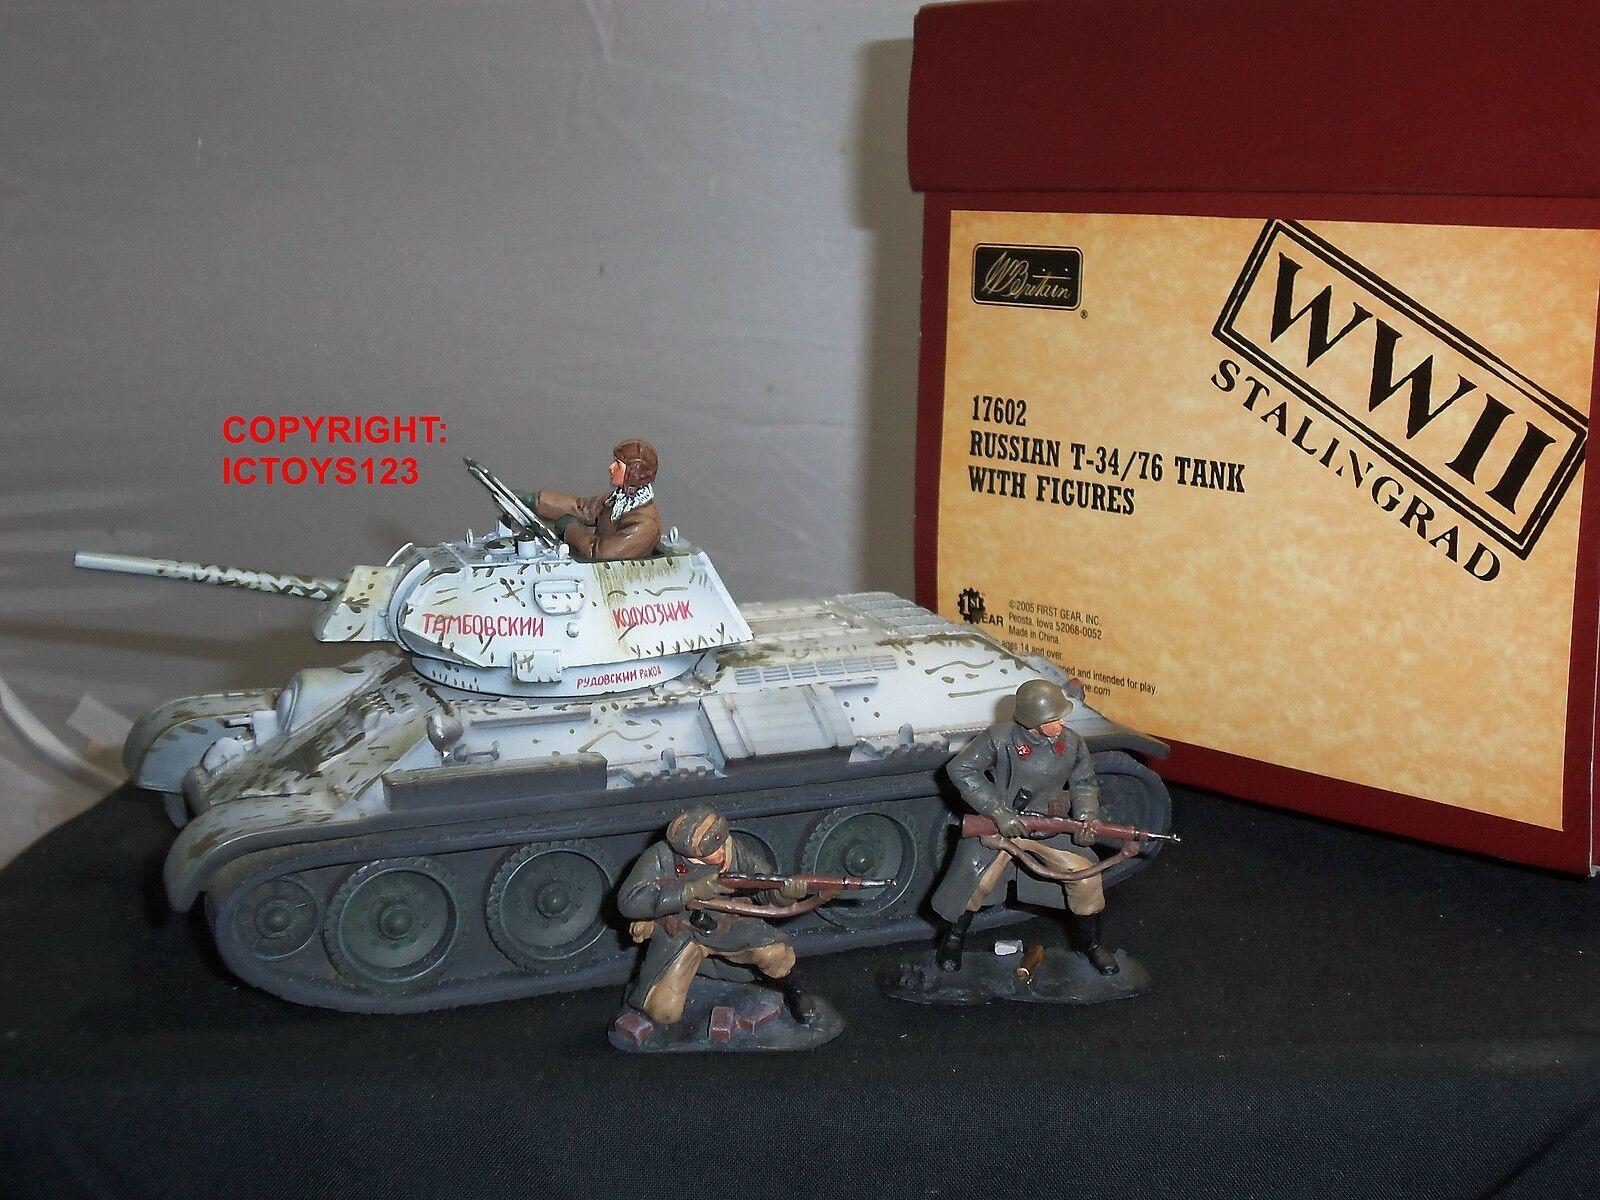 BRITAINS 17602 STALINGRAD RUSSIAN T-34 76 WW2 TANK + CREW METAL TOY SOLDIER SET